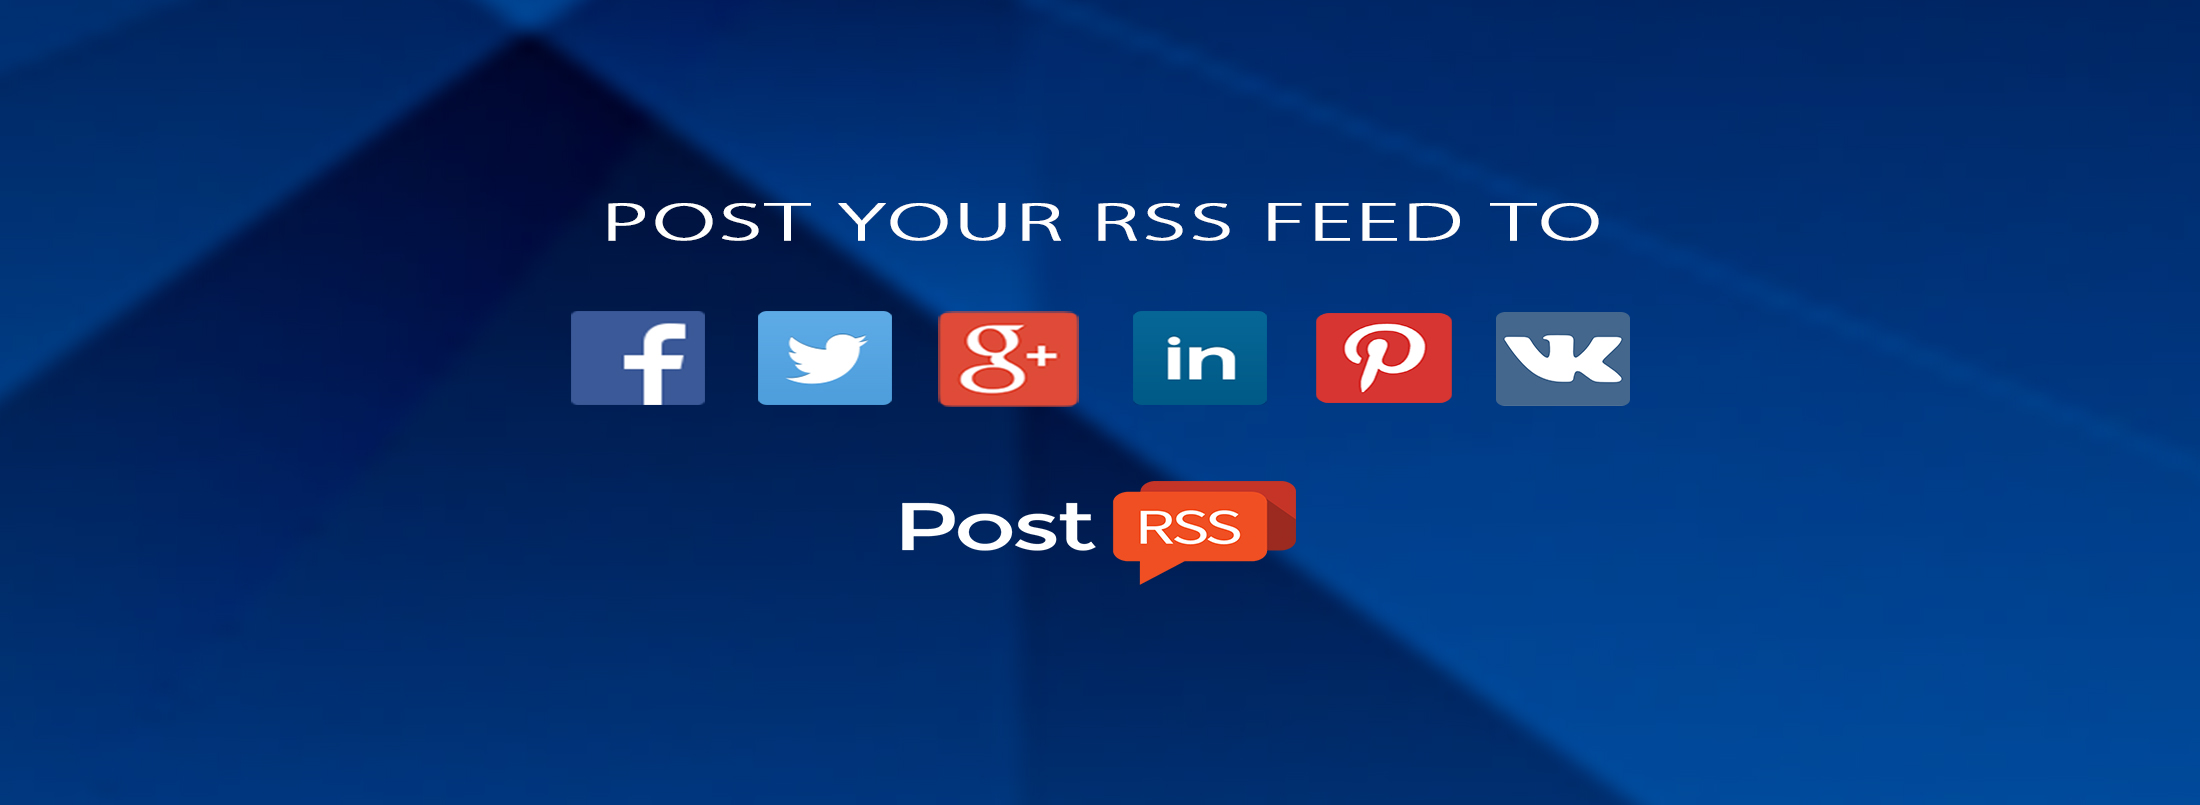 AUTO POST RSS FEED | RSS | PostRSS com